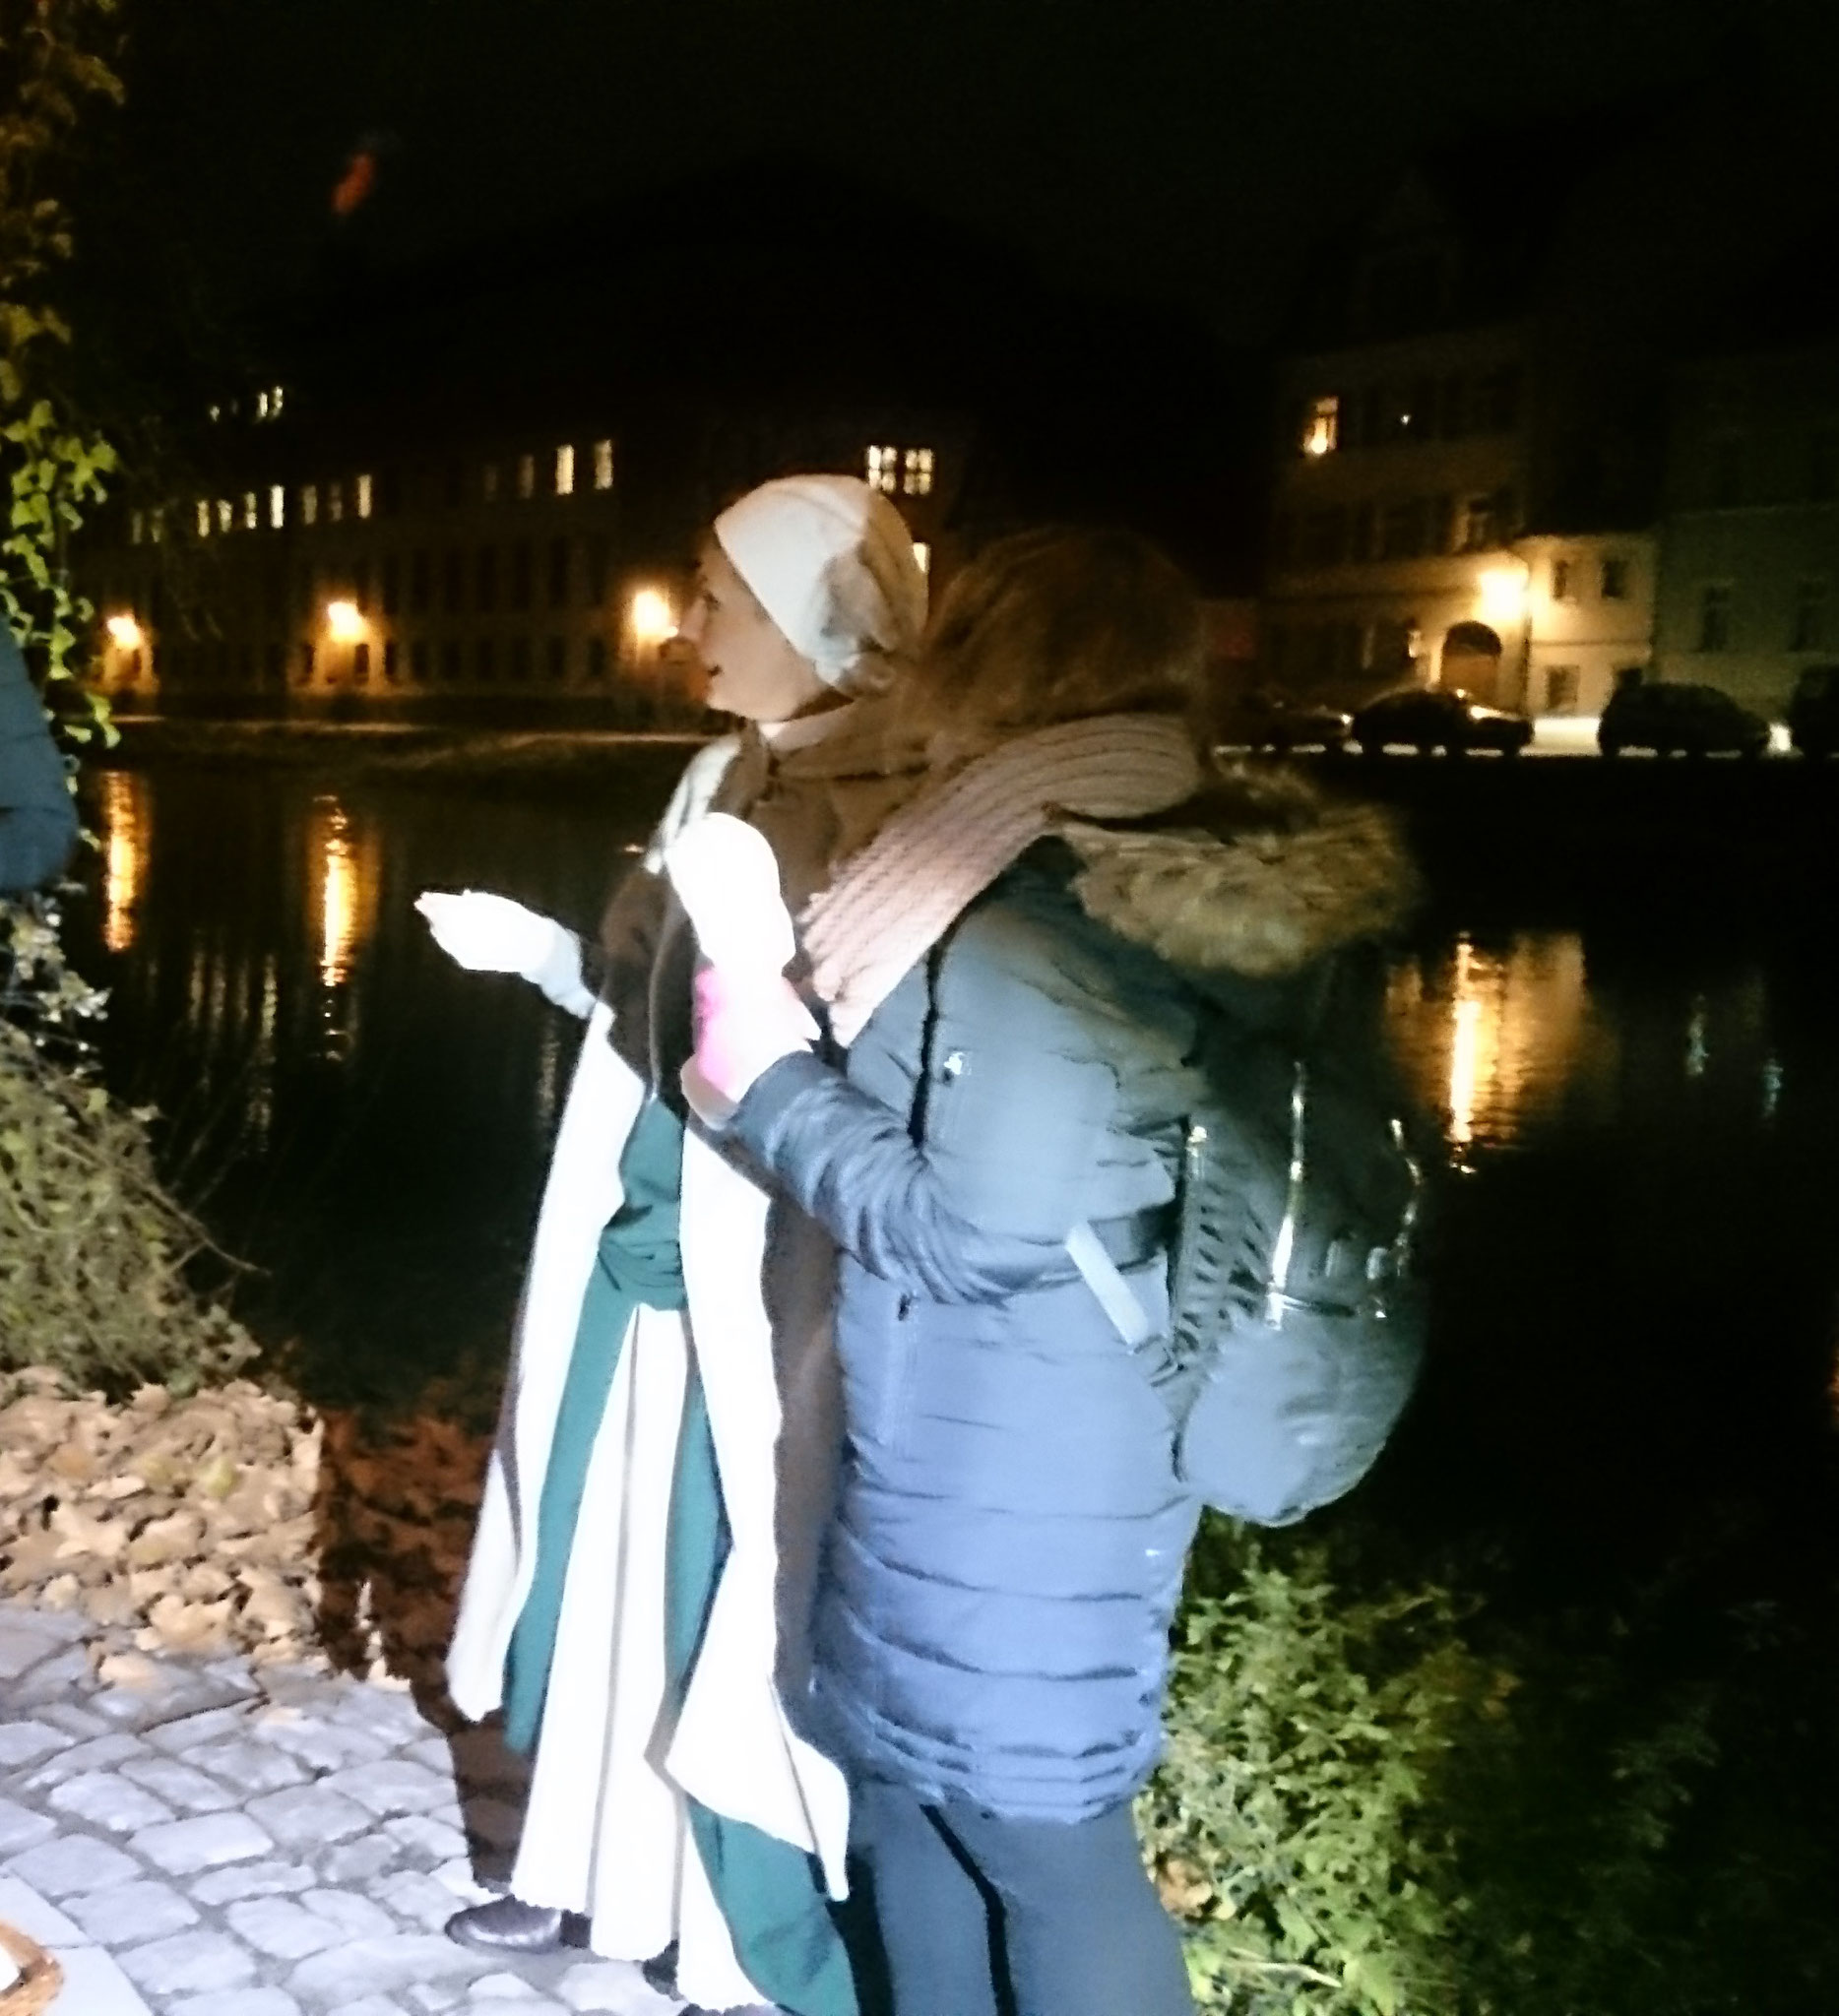 Nachtstimmung am Fluß